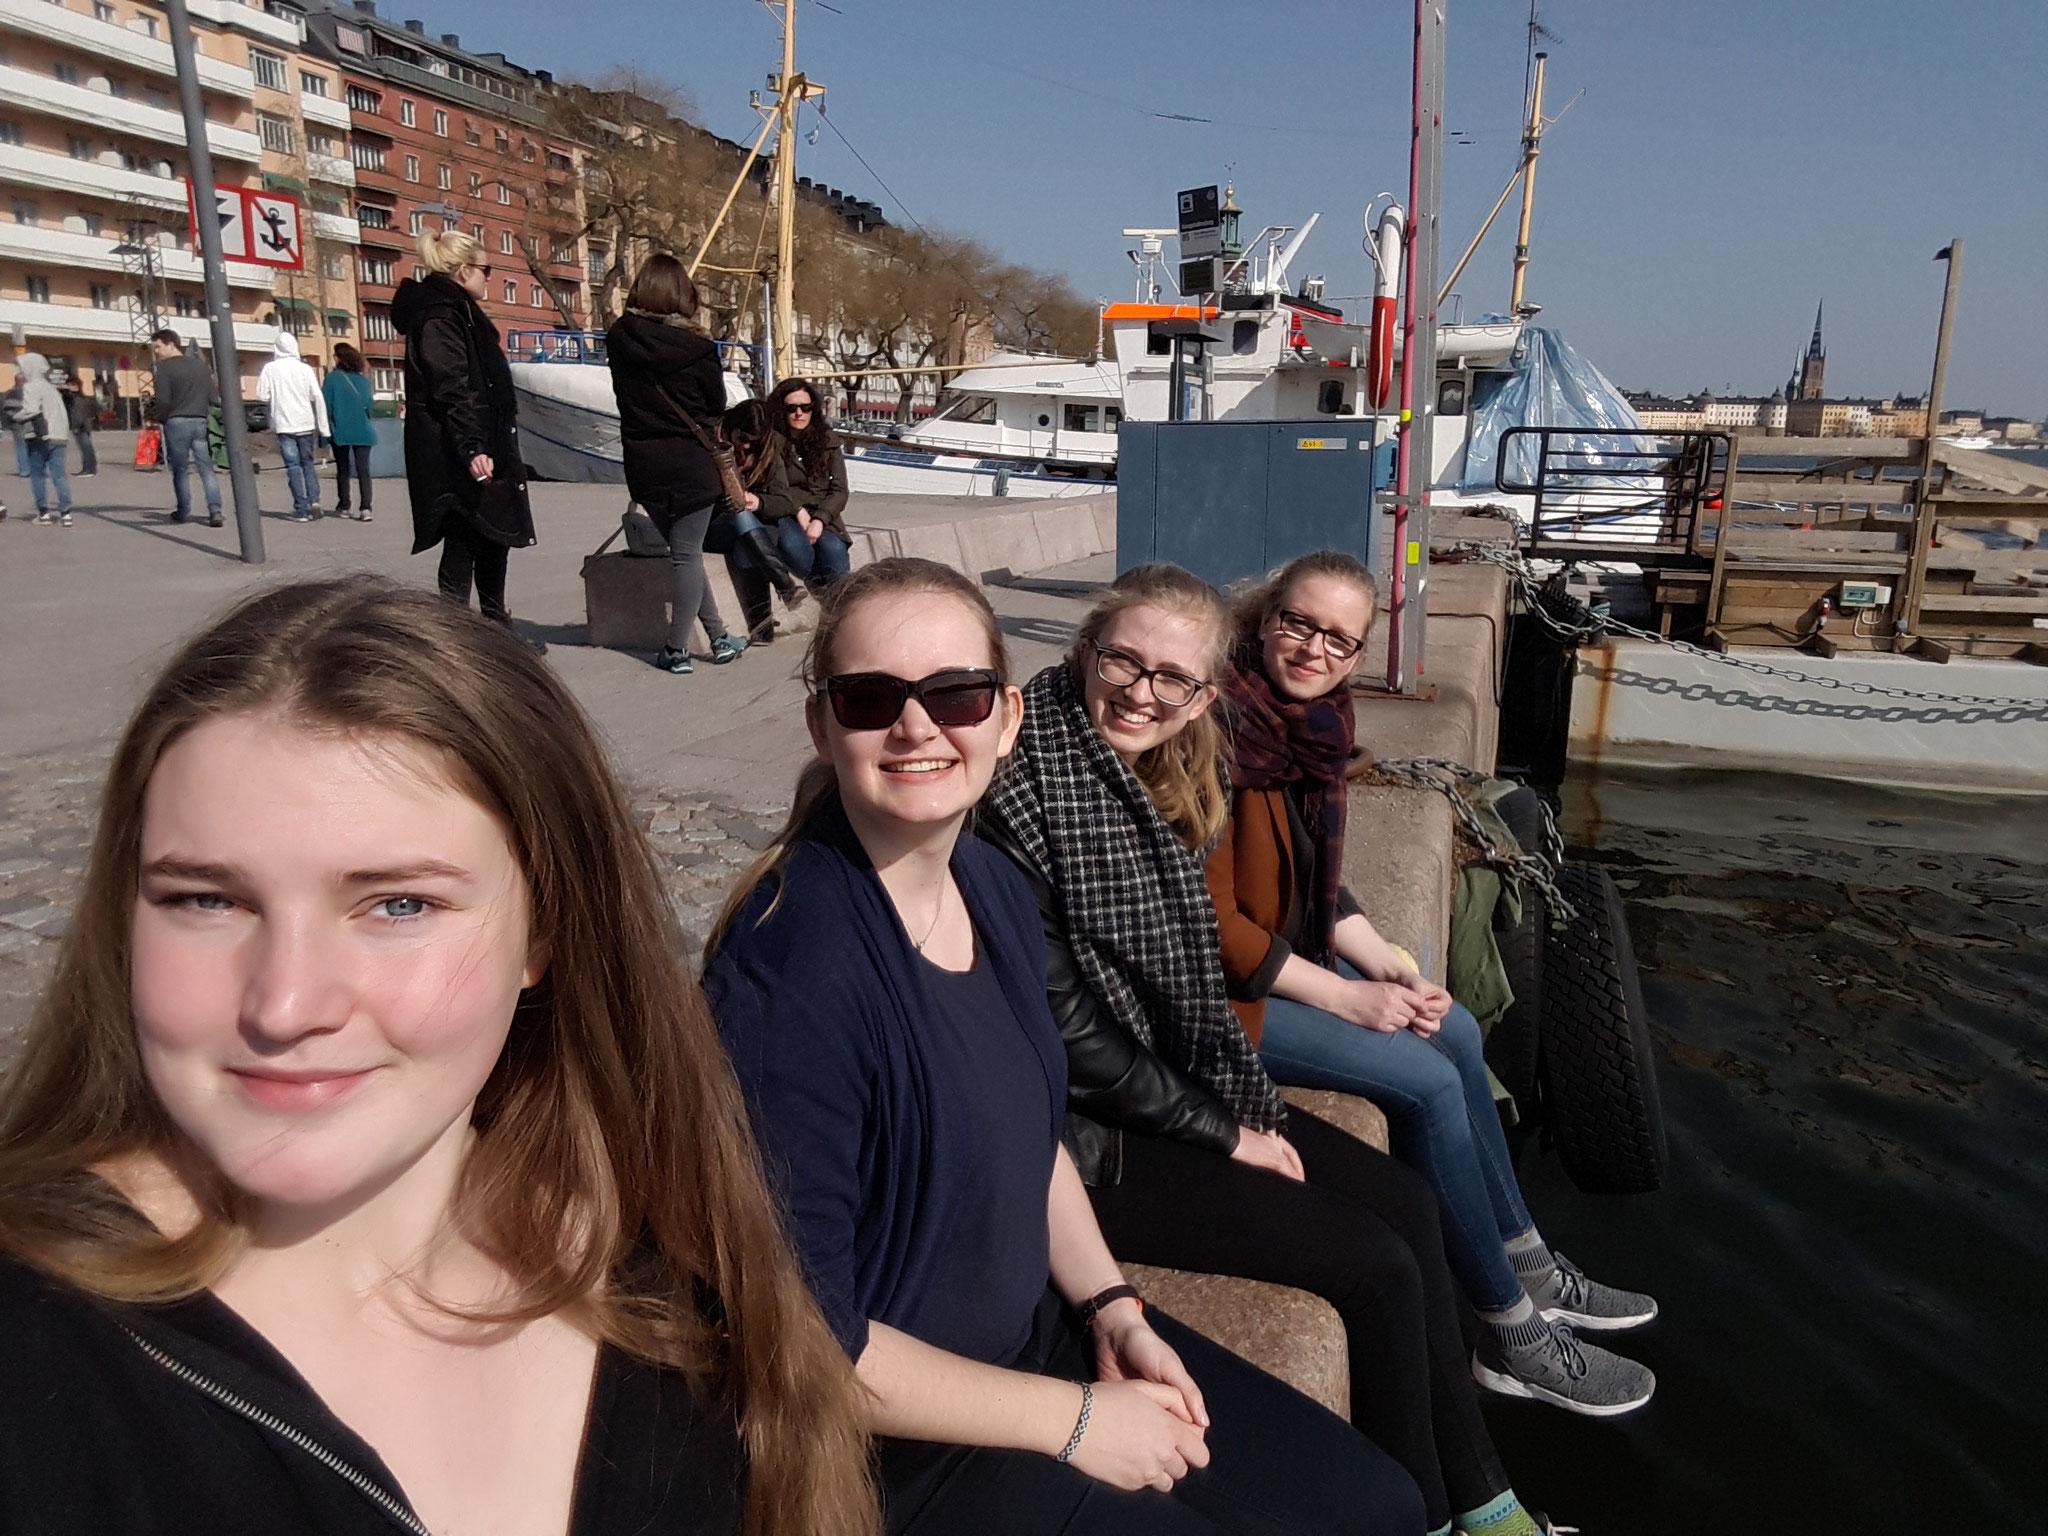 Sonne genießen in Stockholm: Corona Widmayer, Maria Korten, Magdalena Kollbeck und Stephanie Jarvers